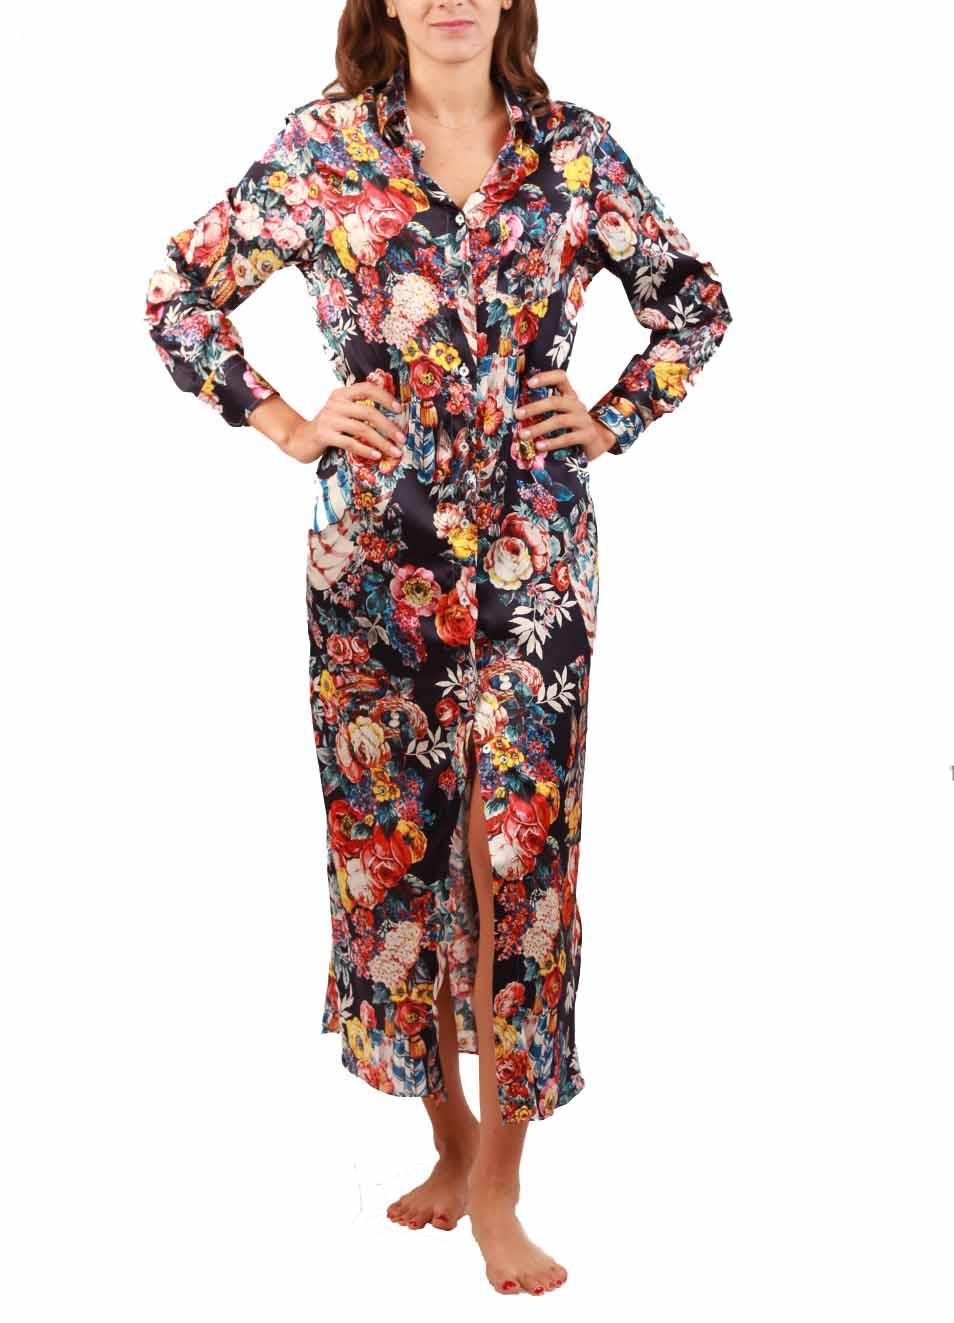 9b79b47cb0 Flower silk long shirt - Laboratorio Capri - Manecapri